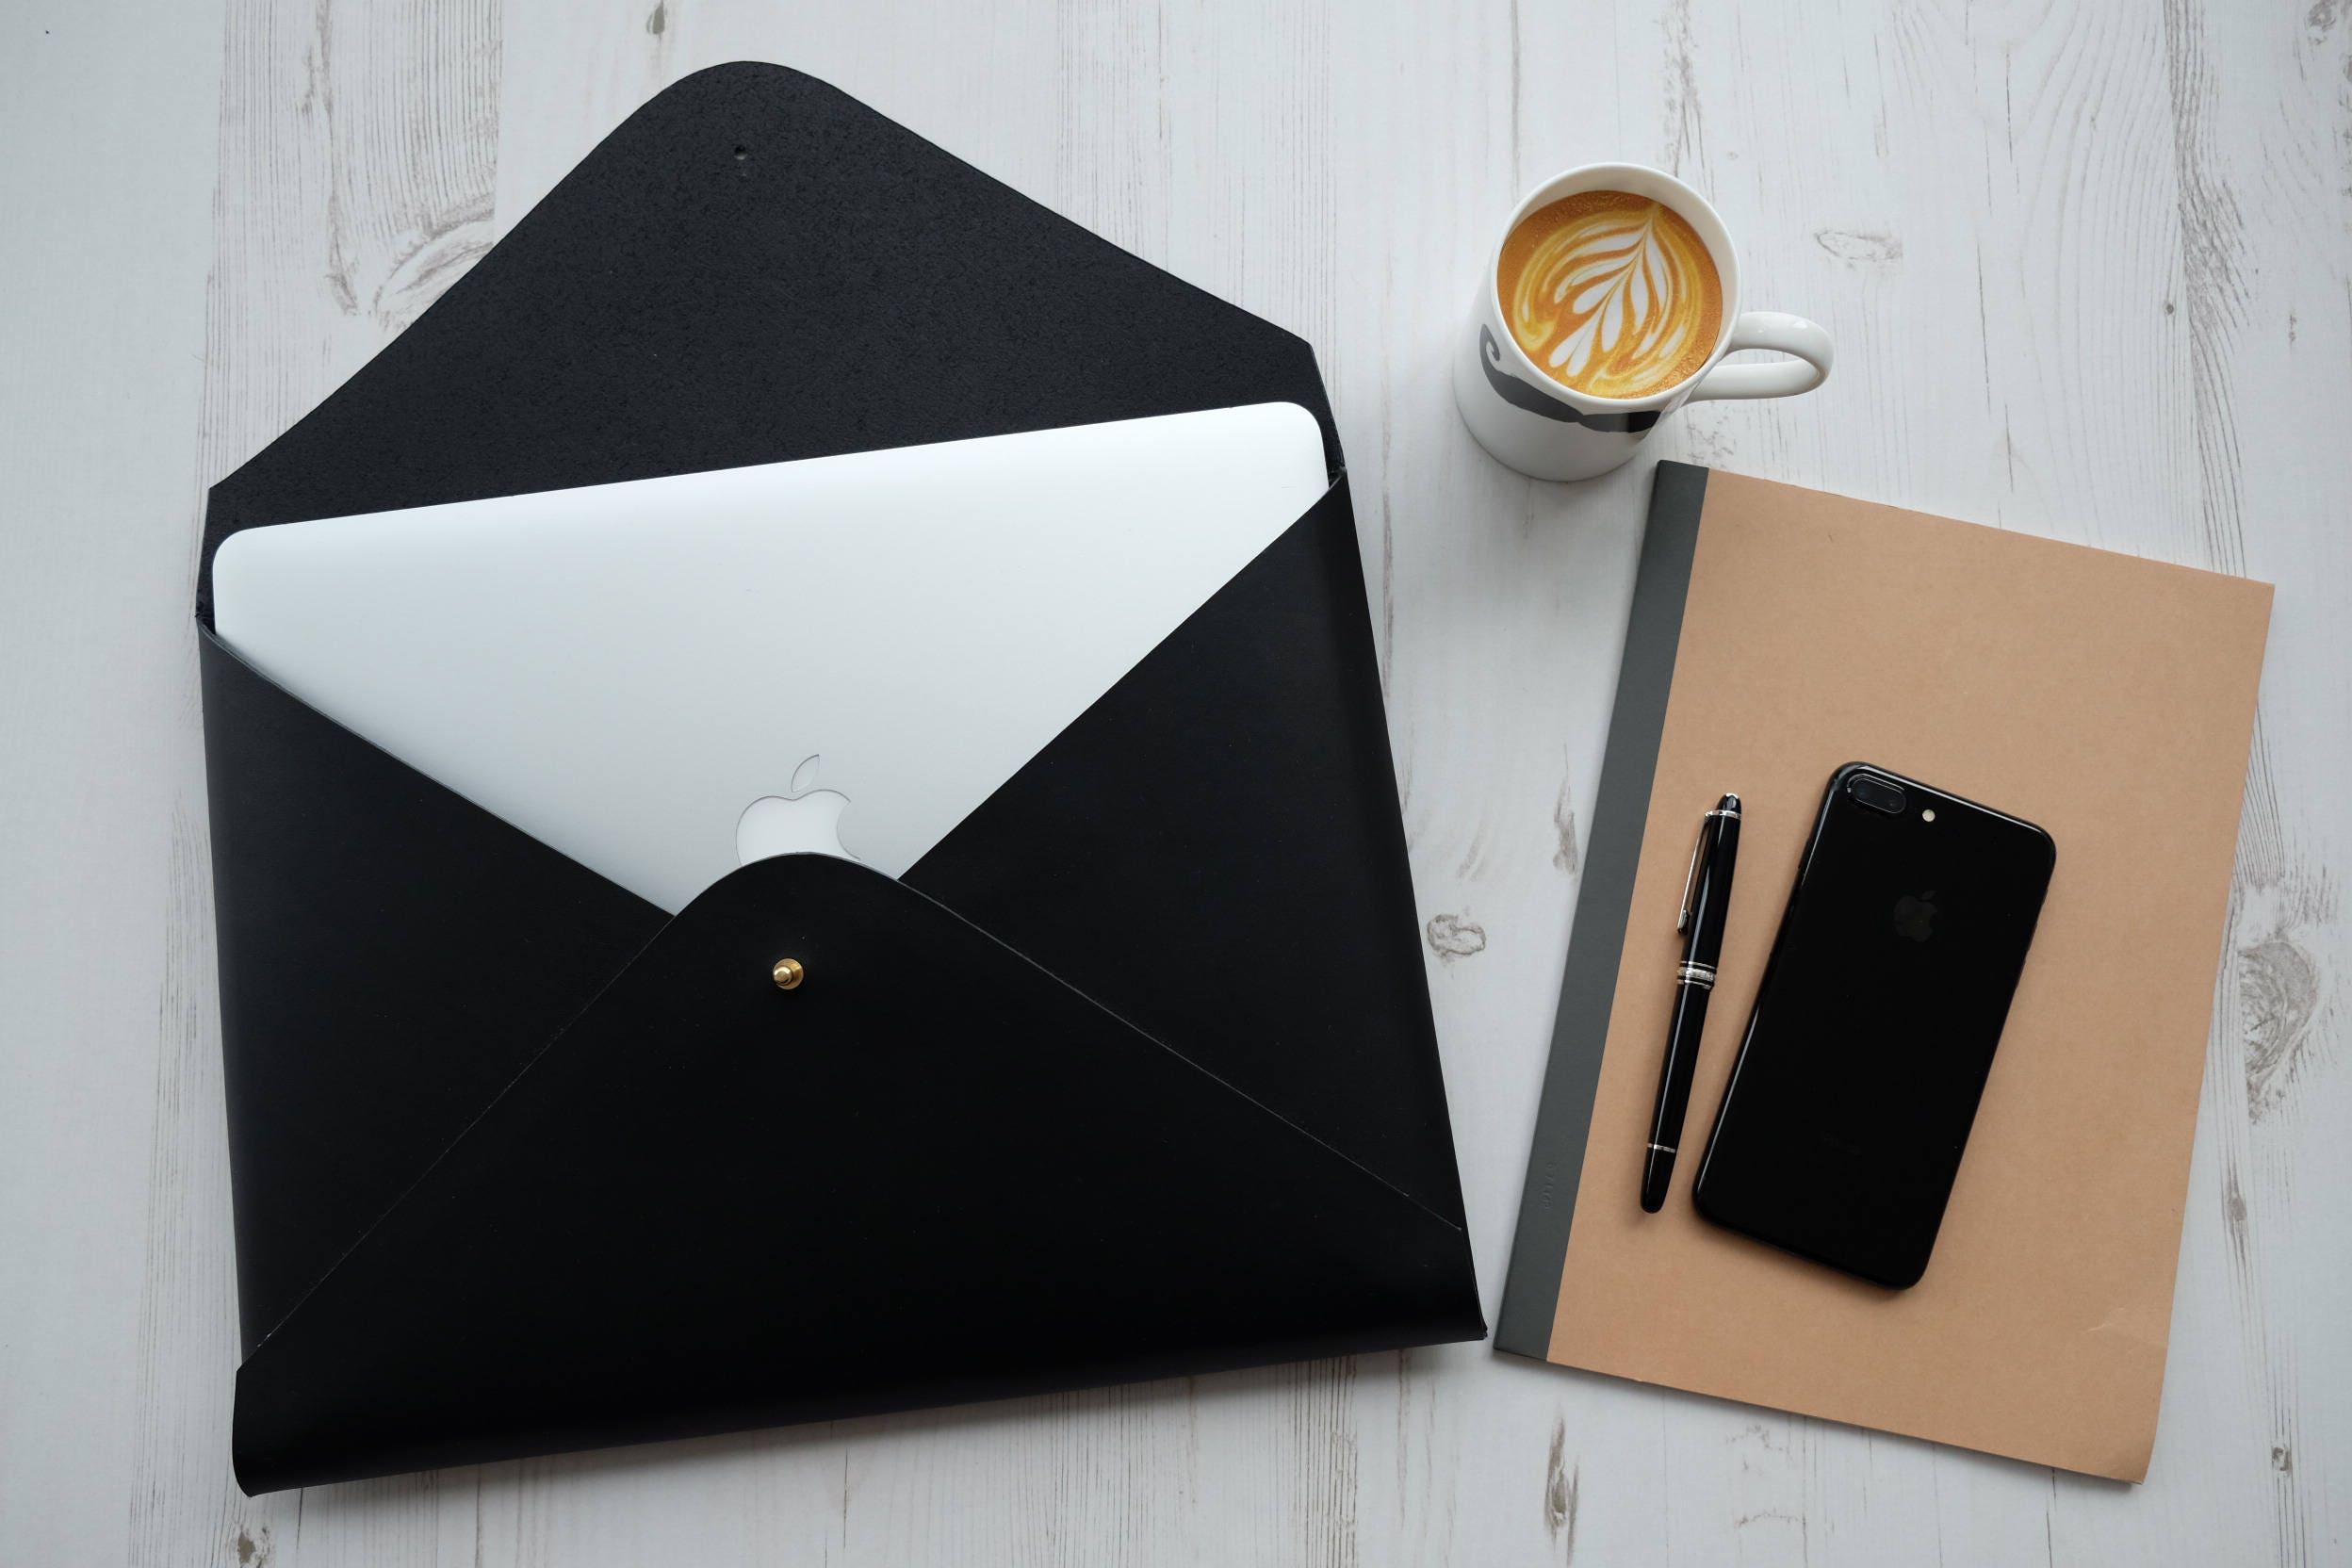 Macbook Pro 15 MONOGRAM Leather Sleeve Case Laptop Holder  Black